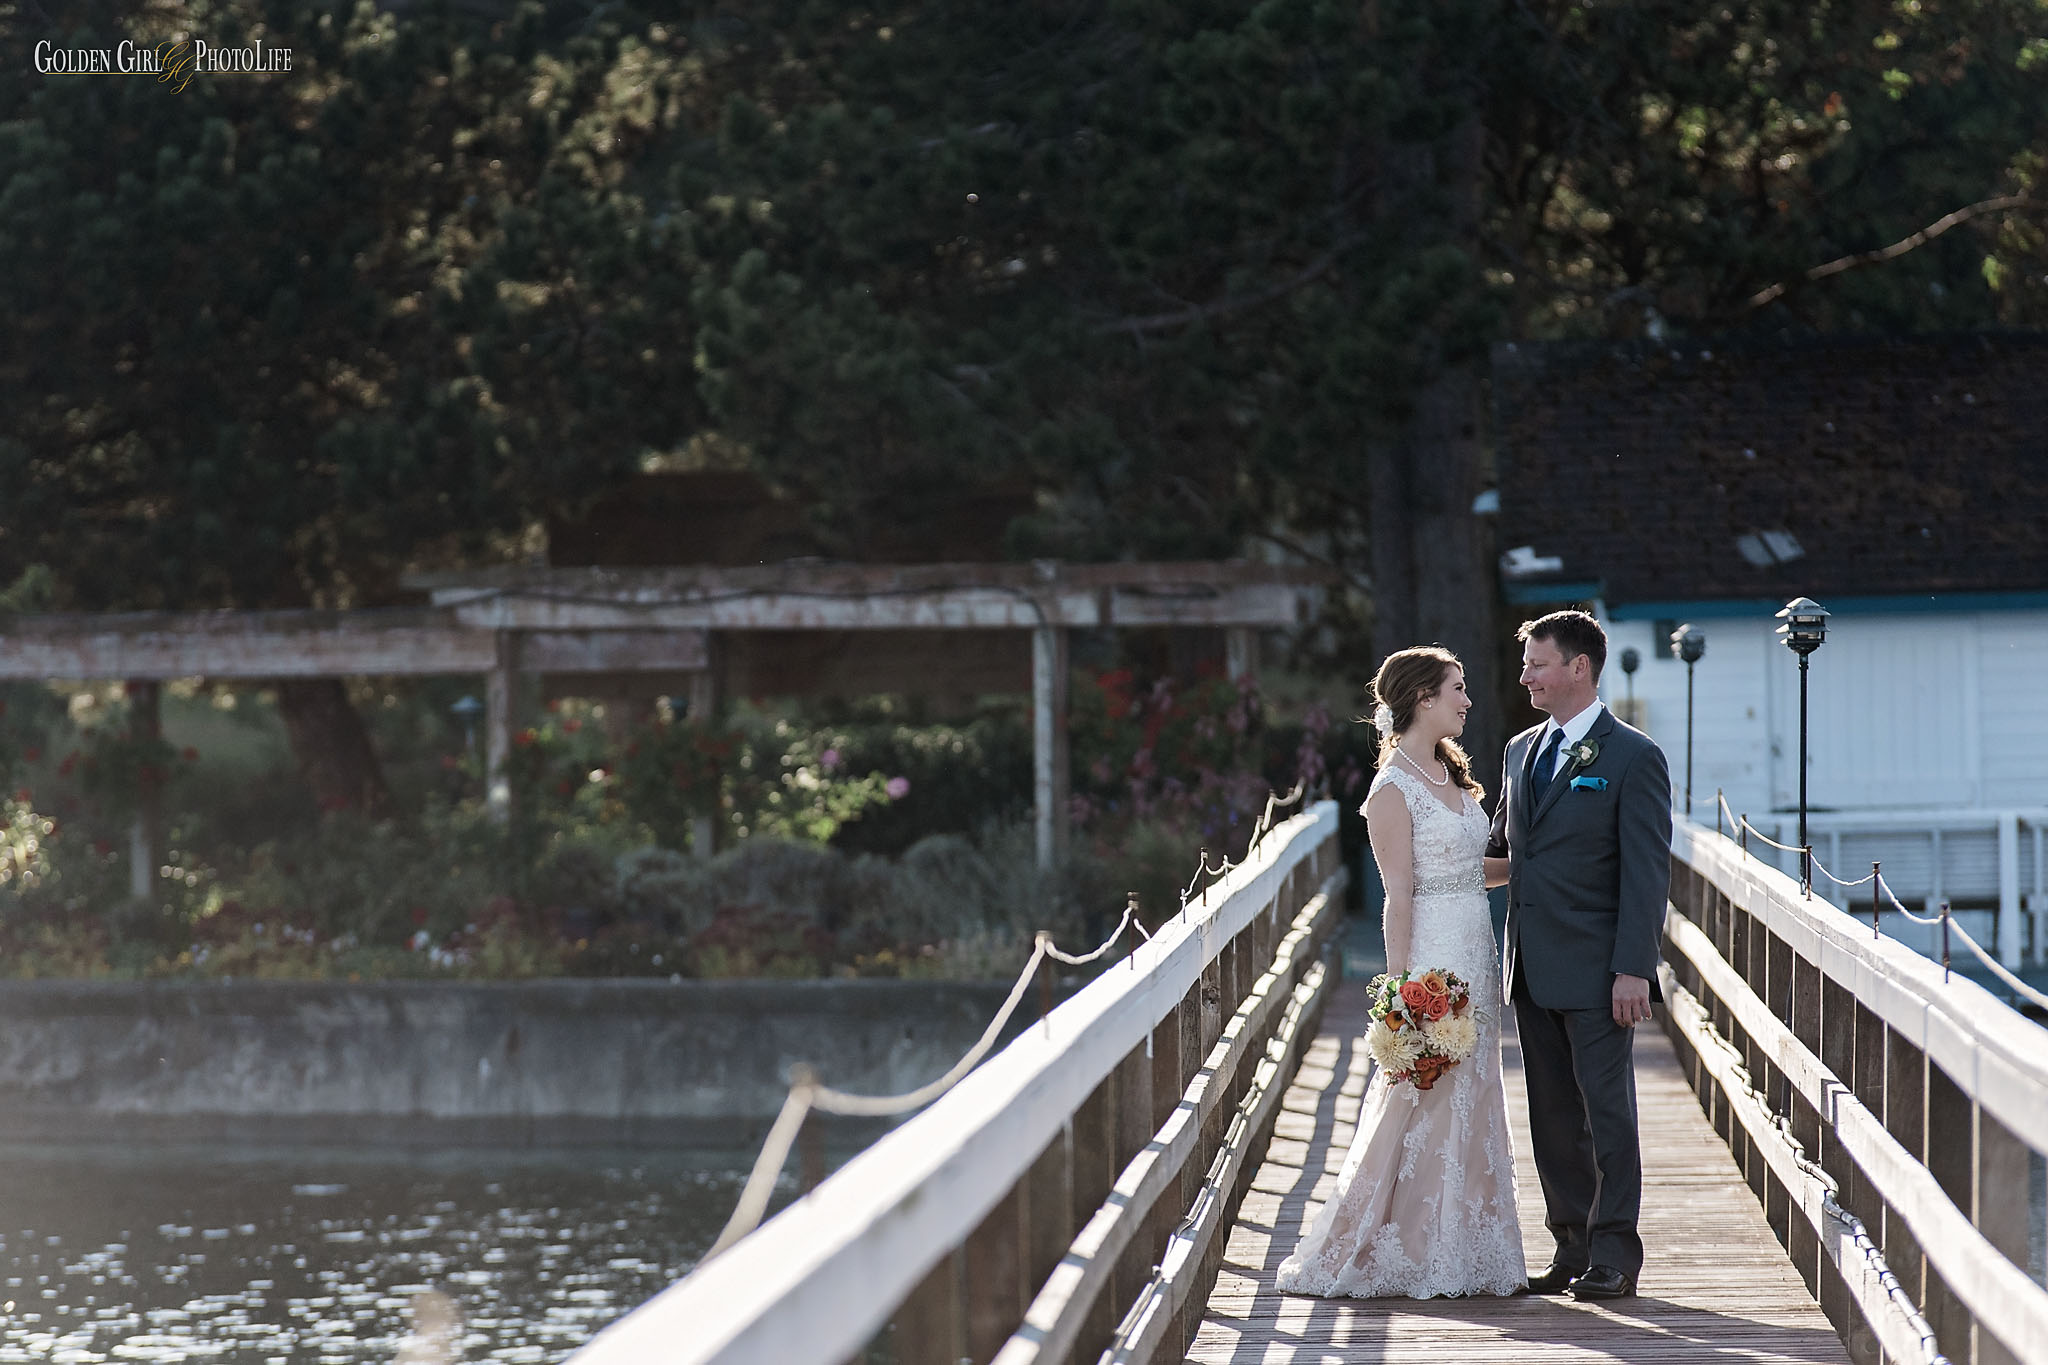 Kiana Lodge Bainbridge Island Poulsbo waterfront wedding autumn